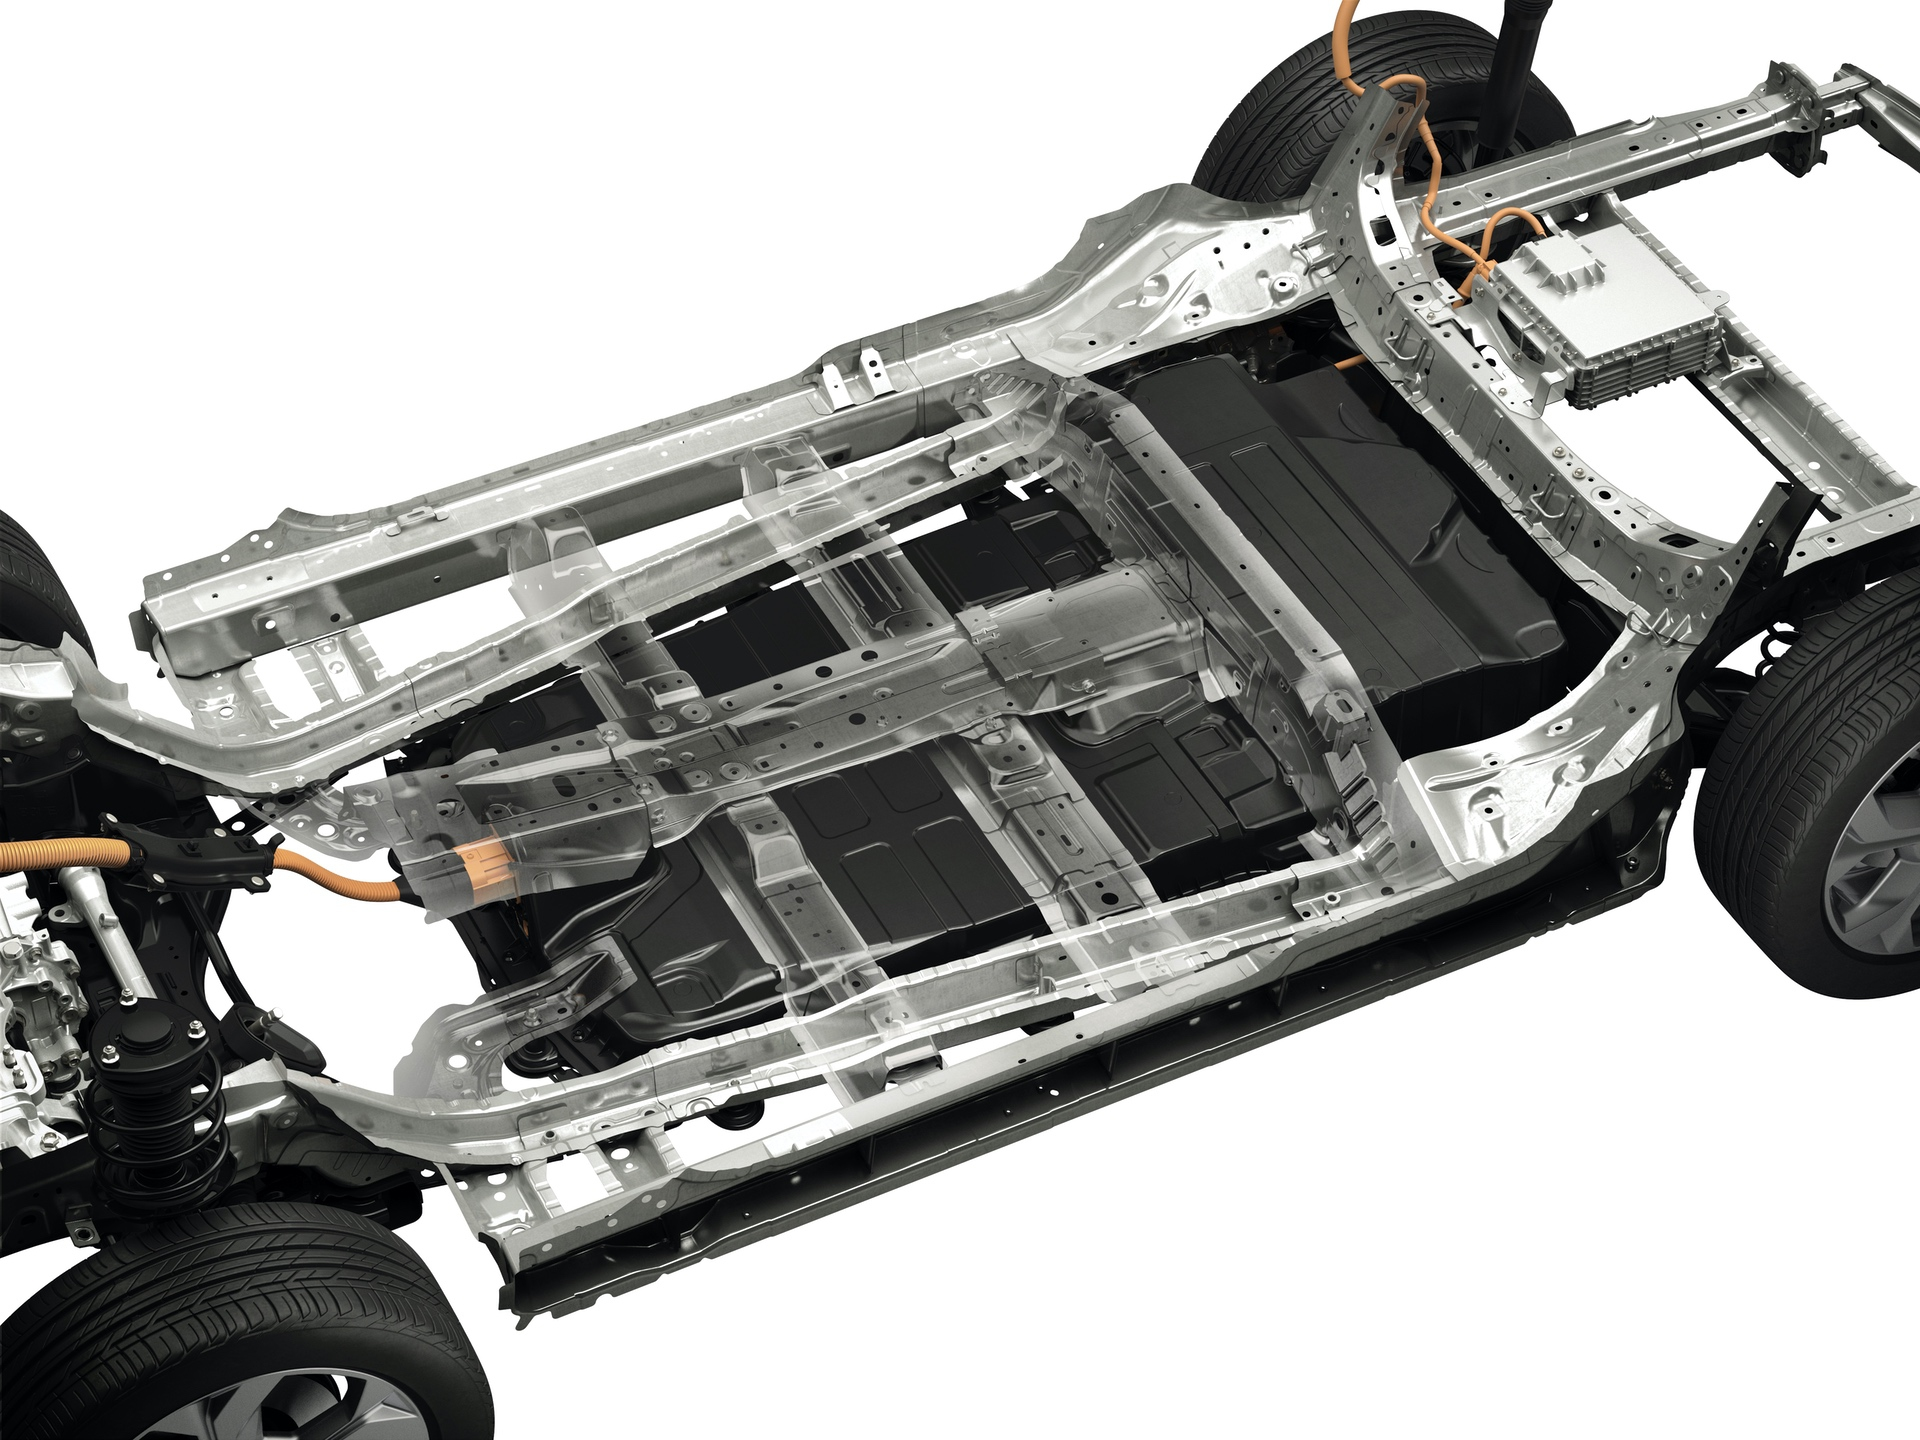 Mazda_MX-30_launch_0105